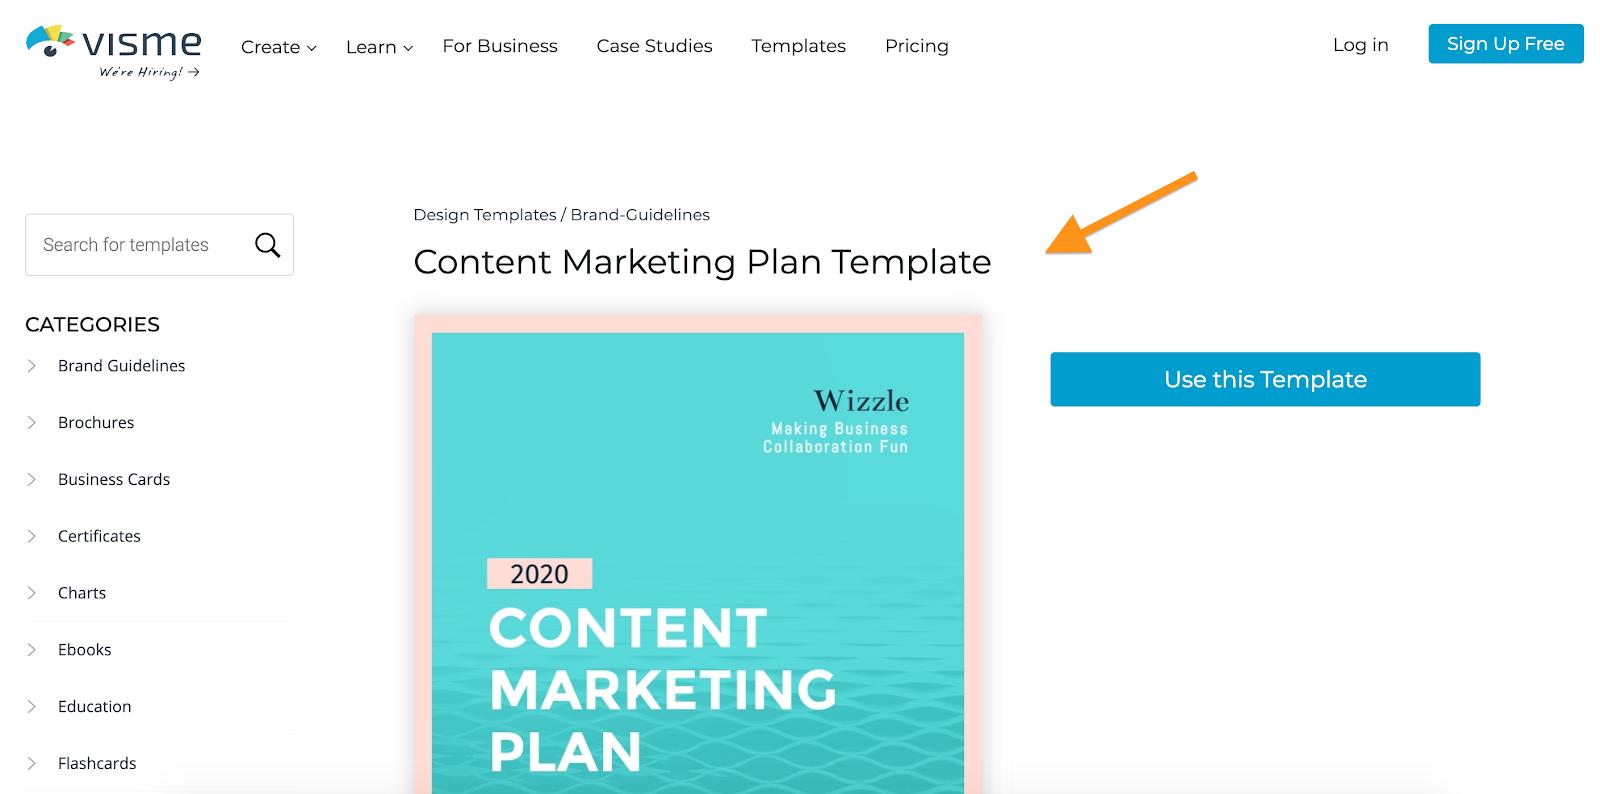 Visme Content Marketing Plan Template